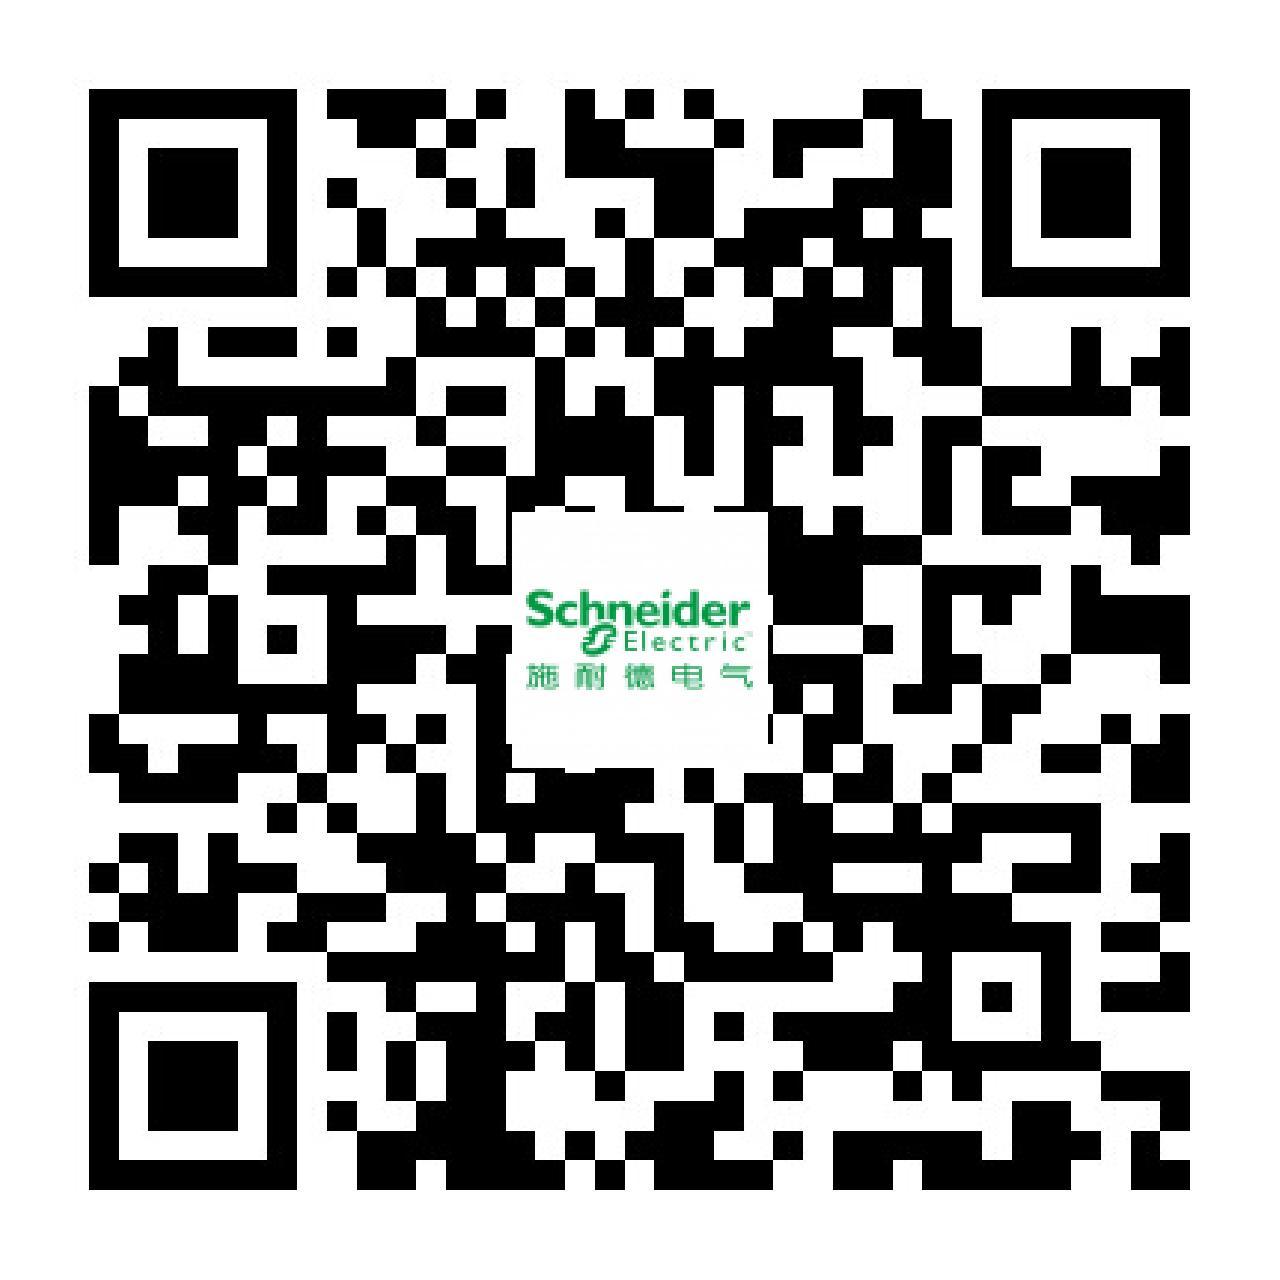 2019CIIF-17-CIIF0023-zhgkw